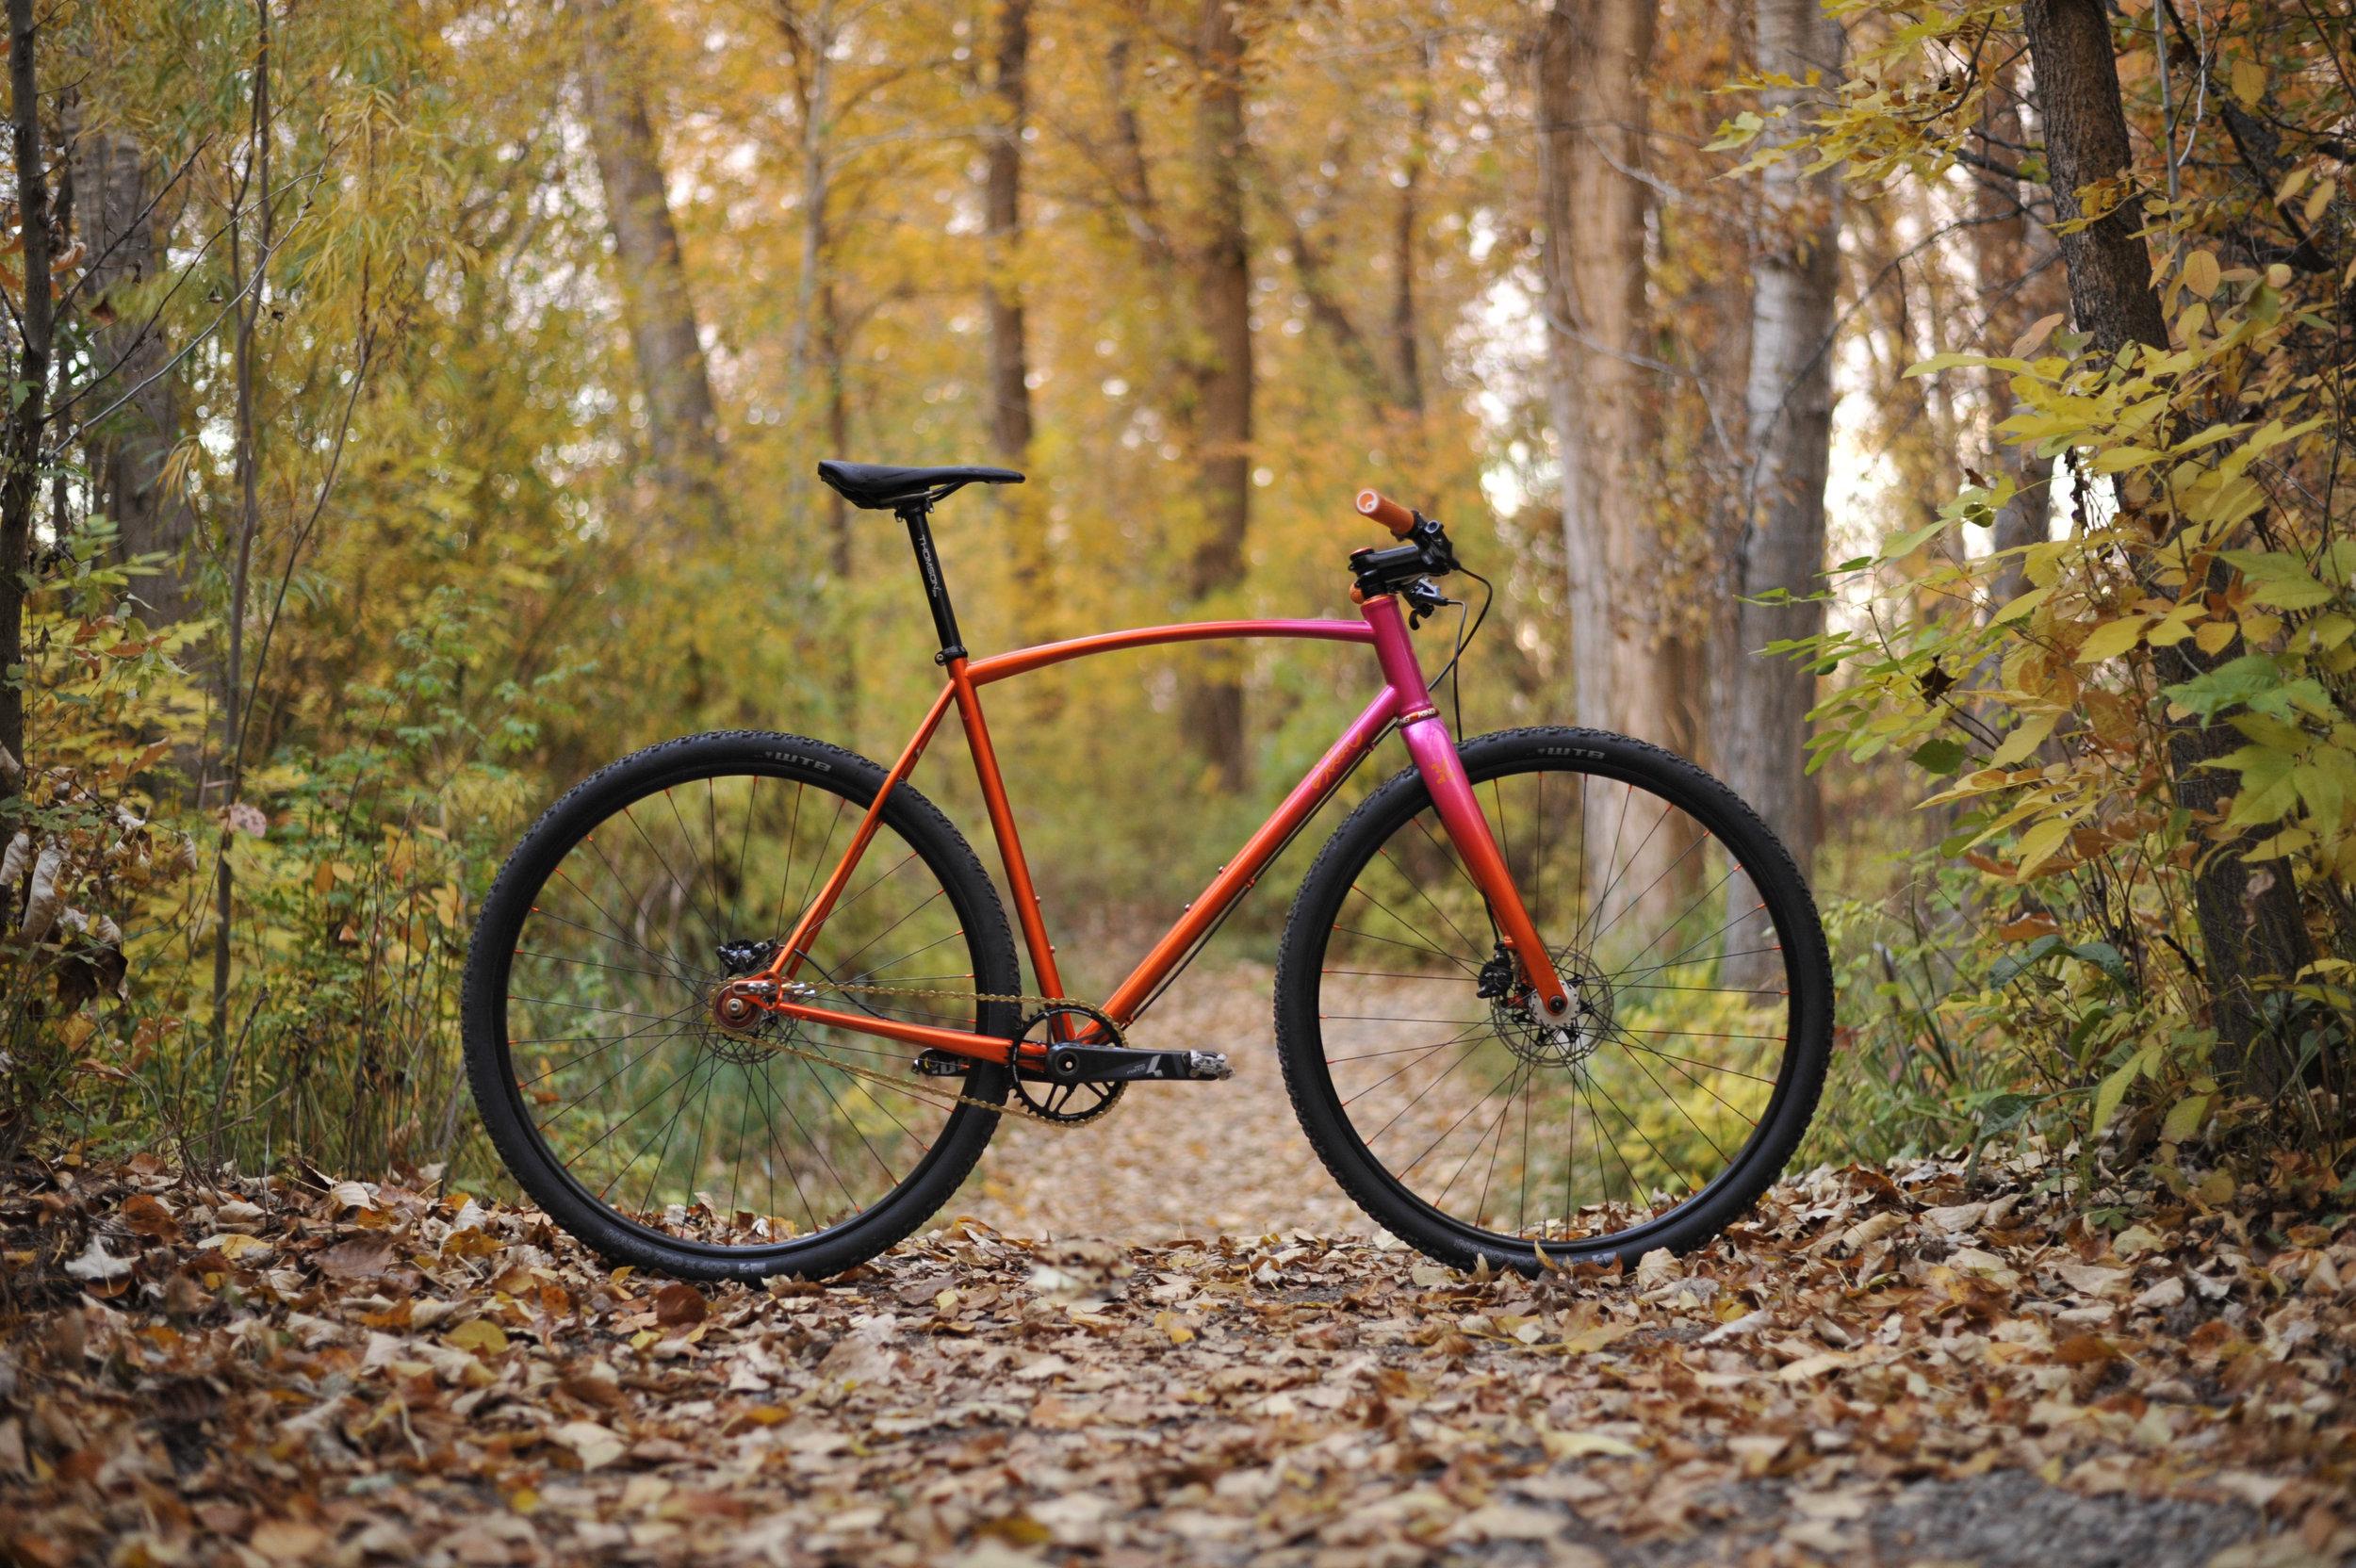 Copy of custom gravel all road adventure bike